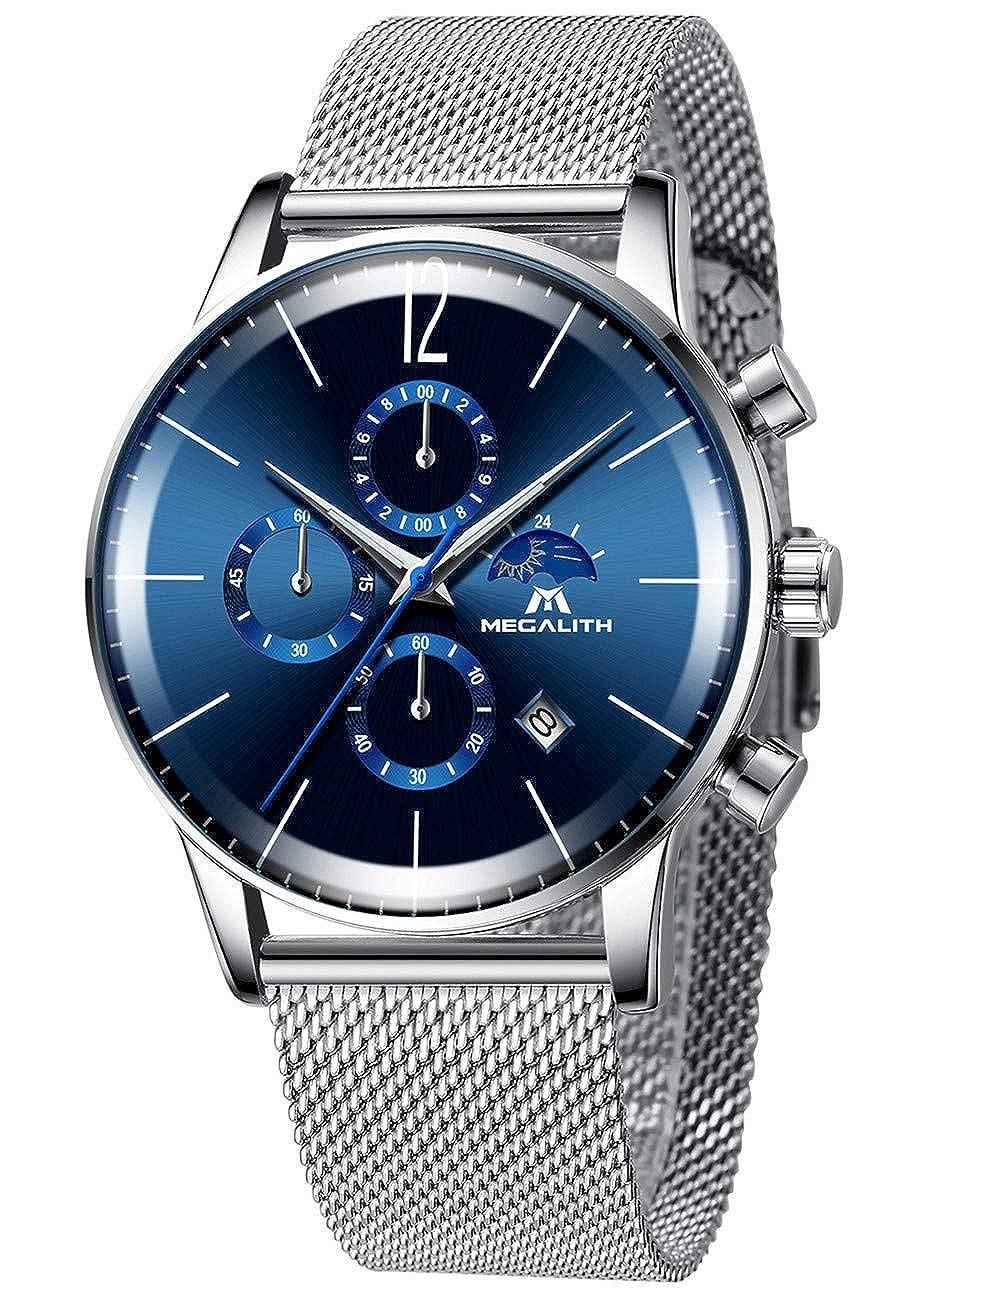 Relojes Hombre Reloj Militar Malla de Acero Inoxidable Analógico Negro Moda Relojes de Pulsera para Hombres de Impermeable Cronógrafo Lujo Diseño ...